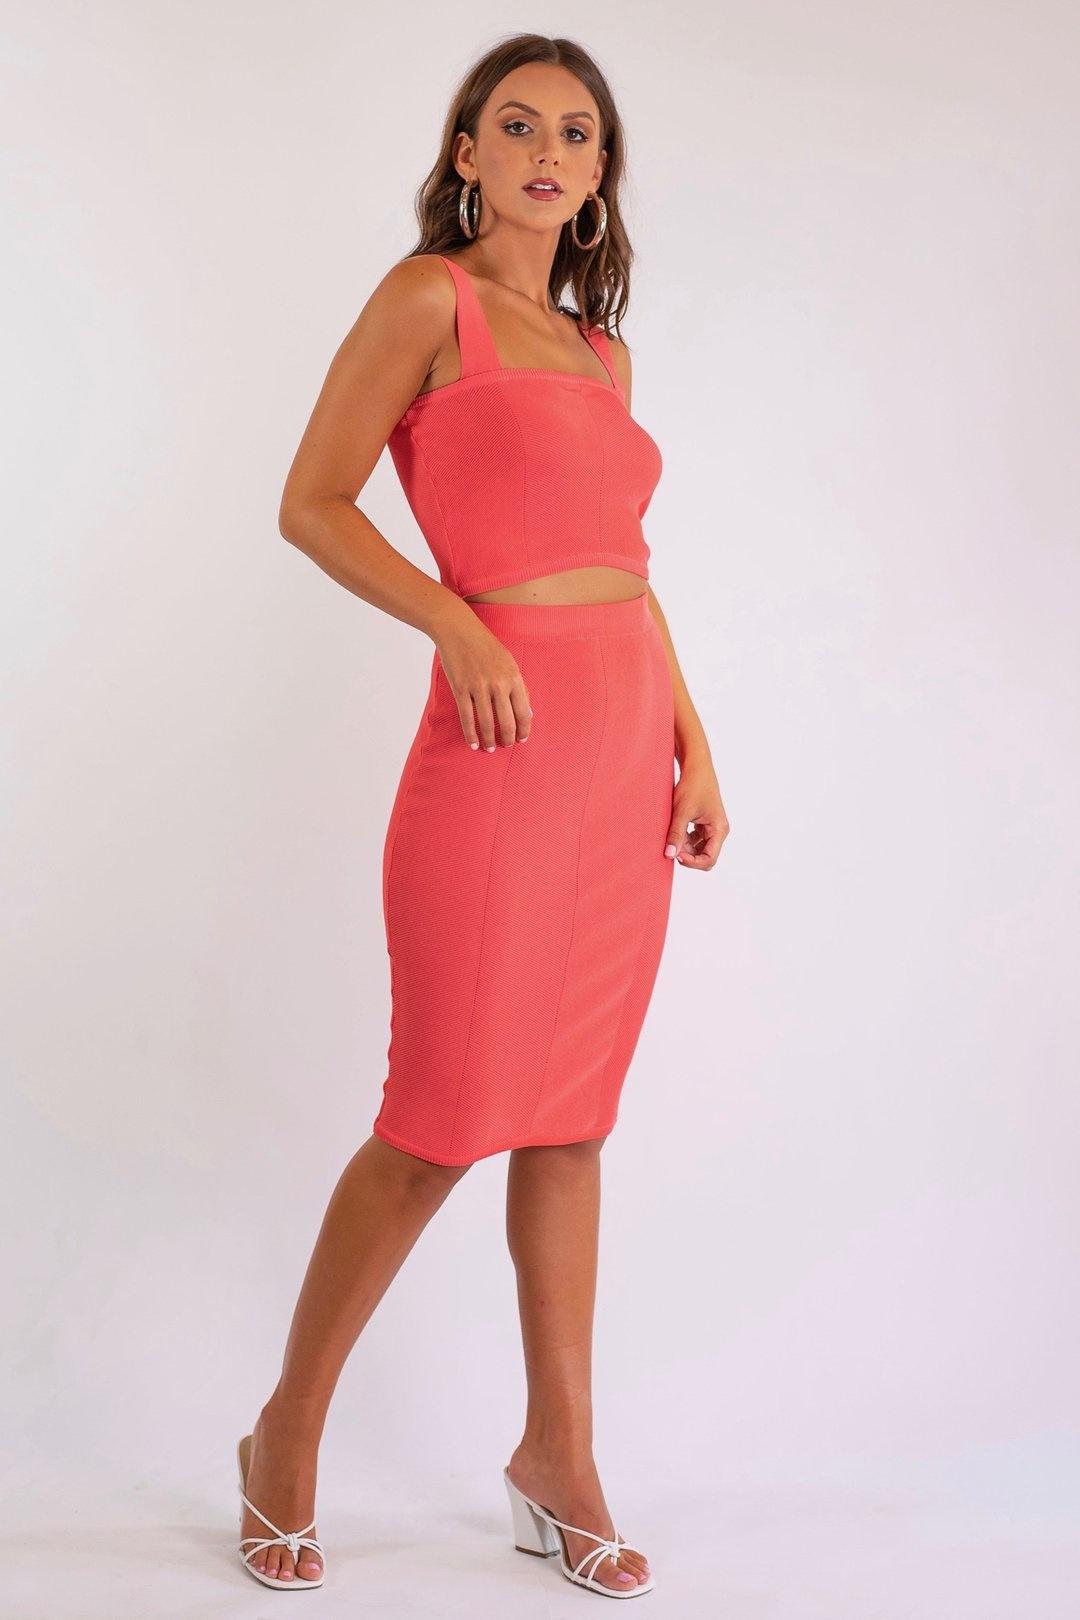 Mink Pink Chevron Knit Skirt